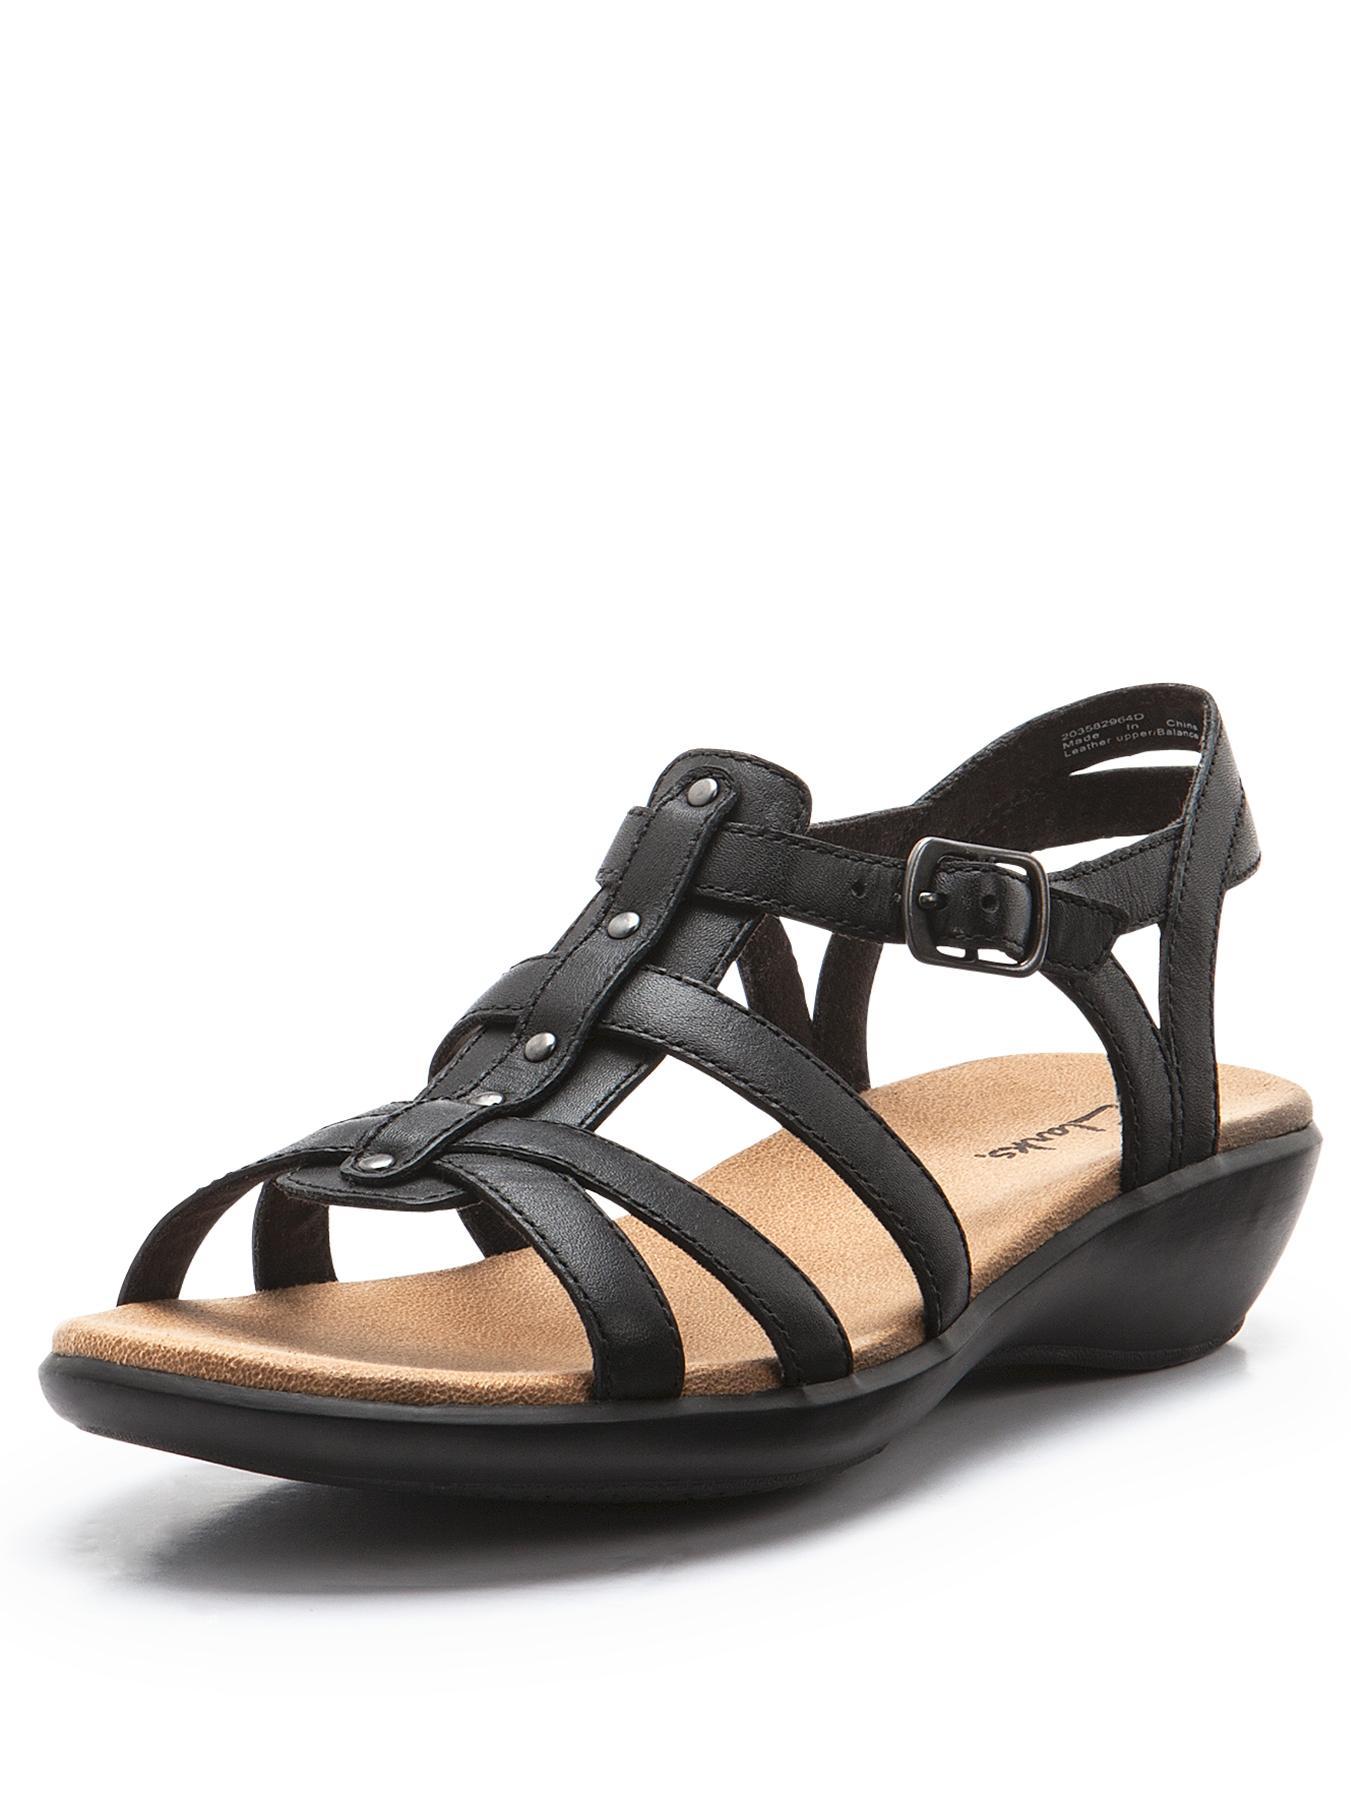 Clarks Roza Jaida Gladiator Strap Sandals black | Designer-Fashion